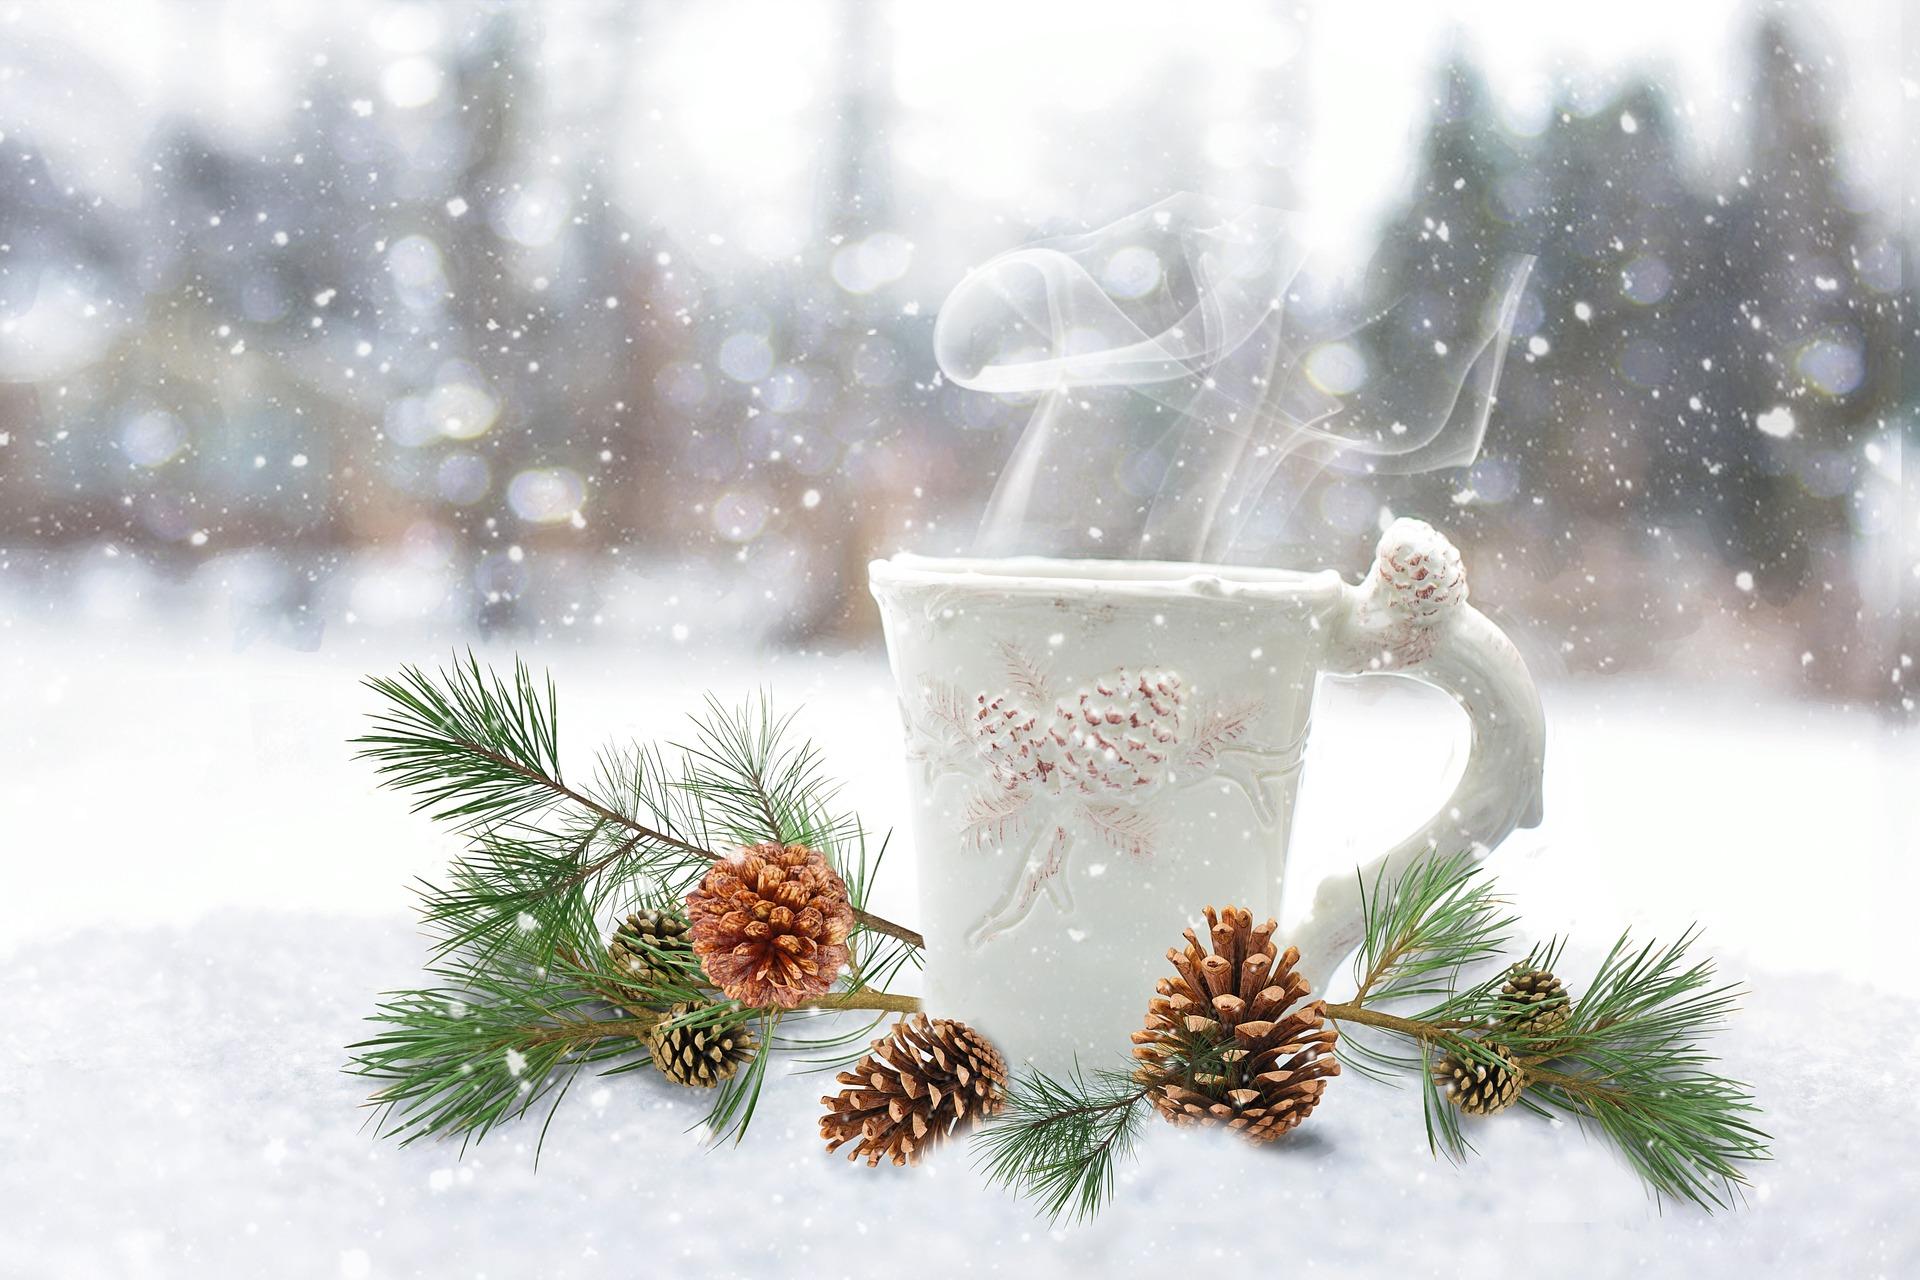 coffee-1156597_1920.jpg